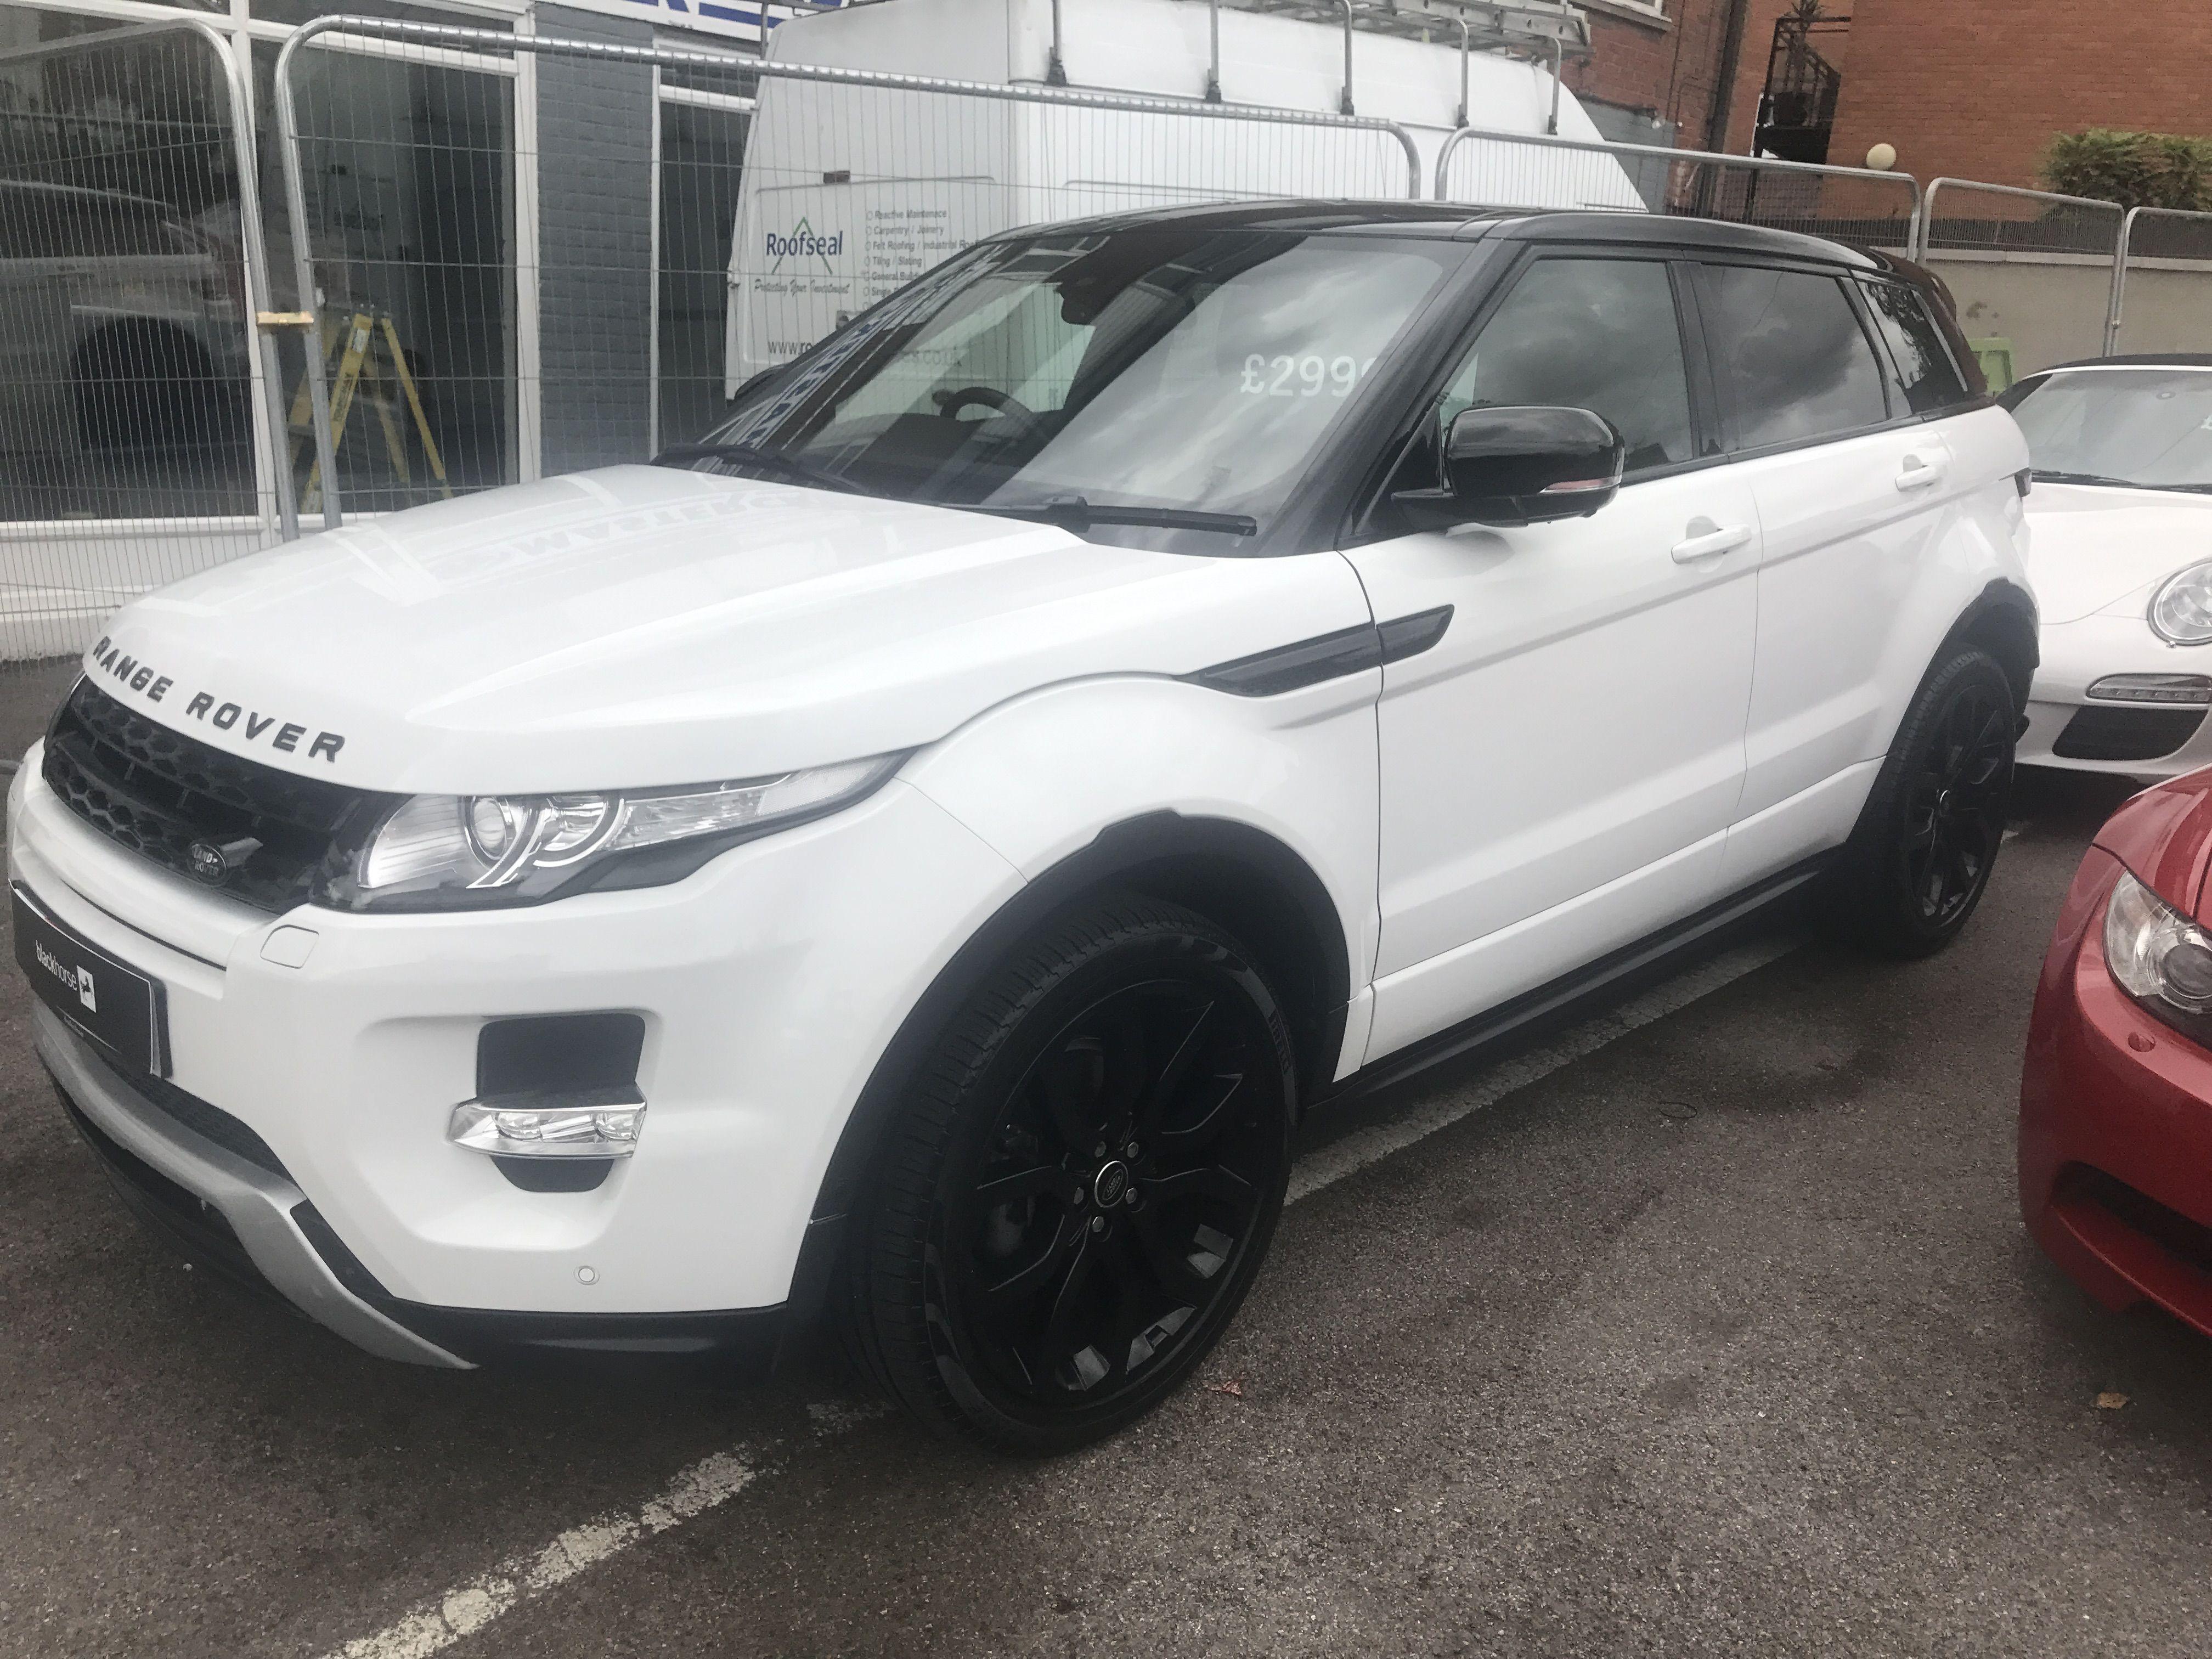 White Range Rover Evoque for sale in Hertfordshire at Master Car